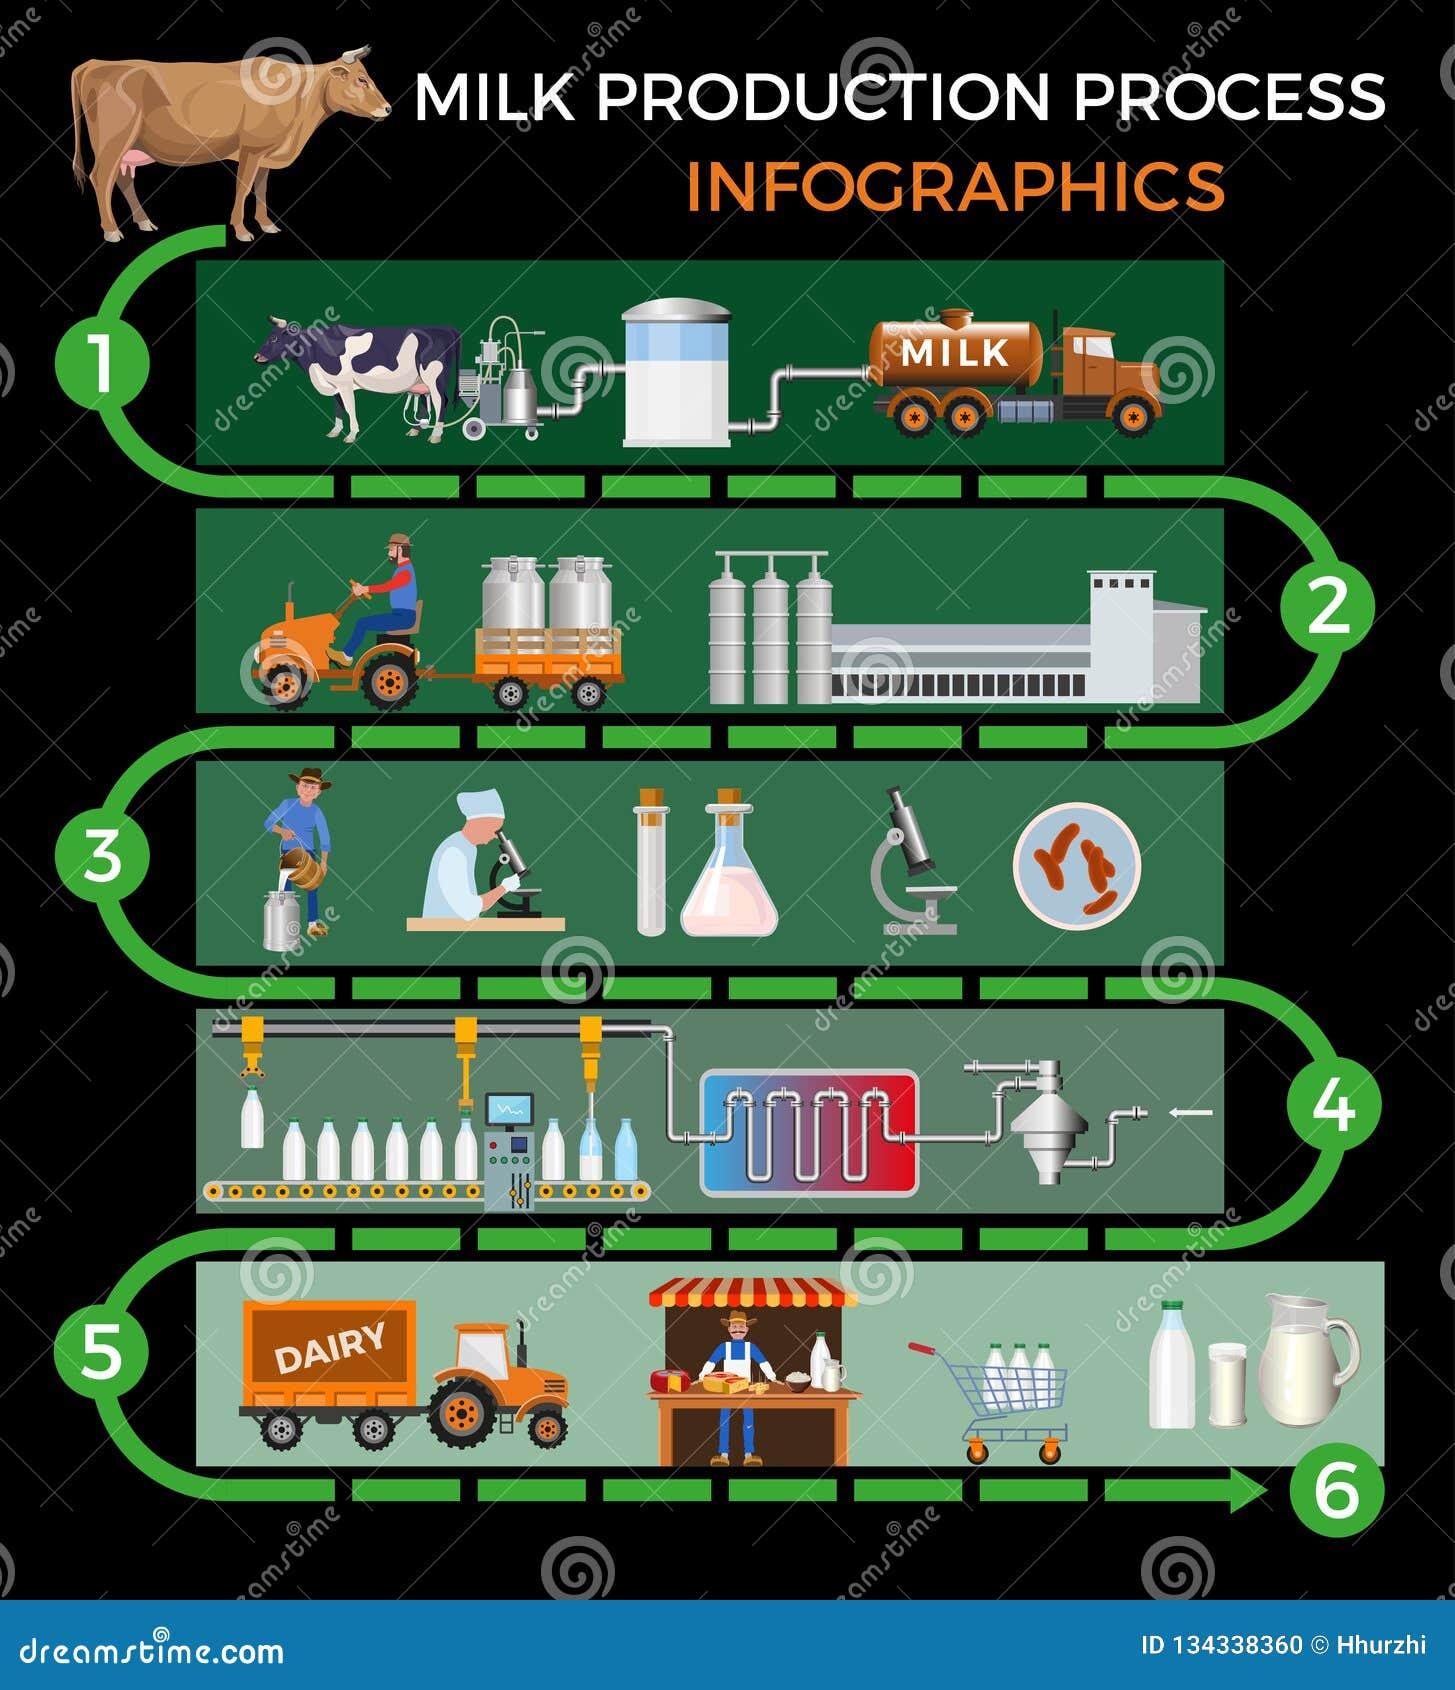 Proceso de producción de leche